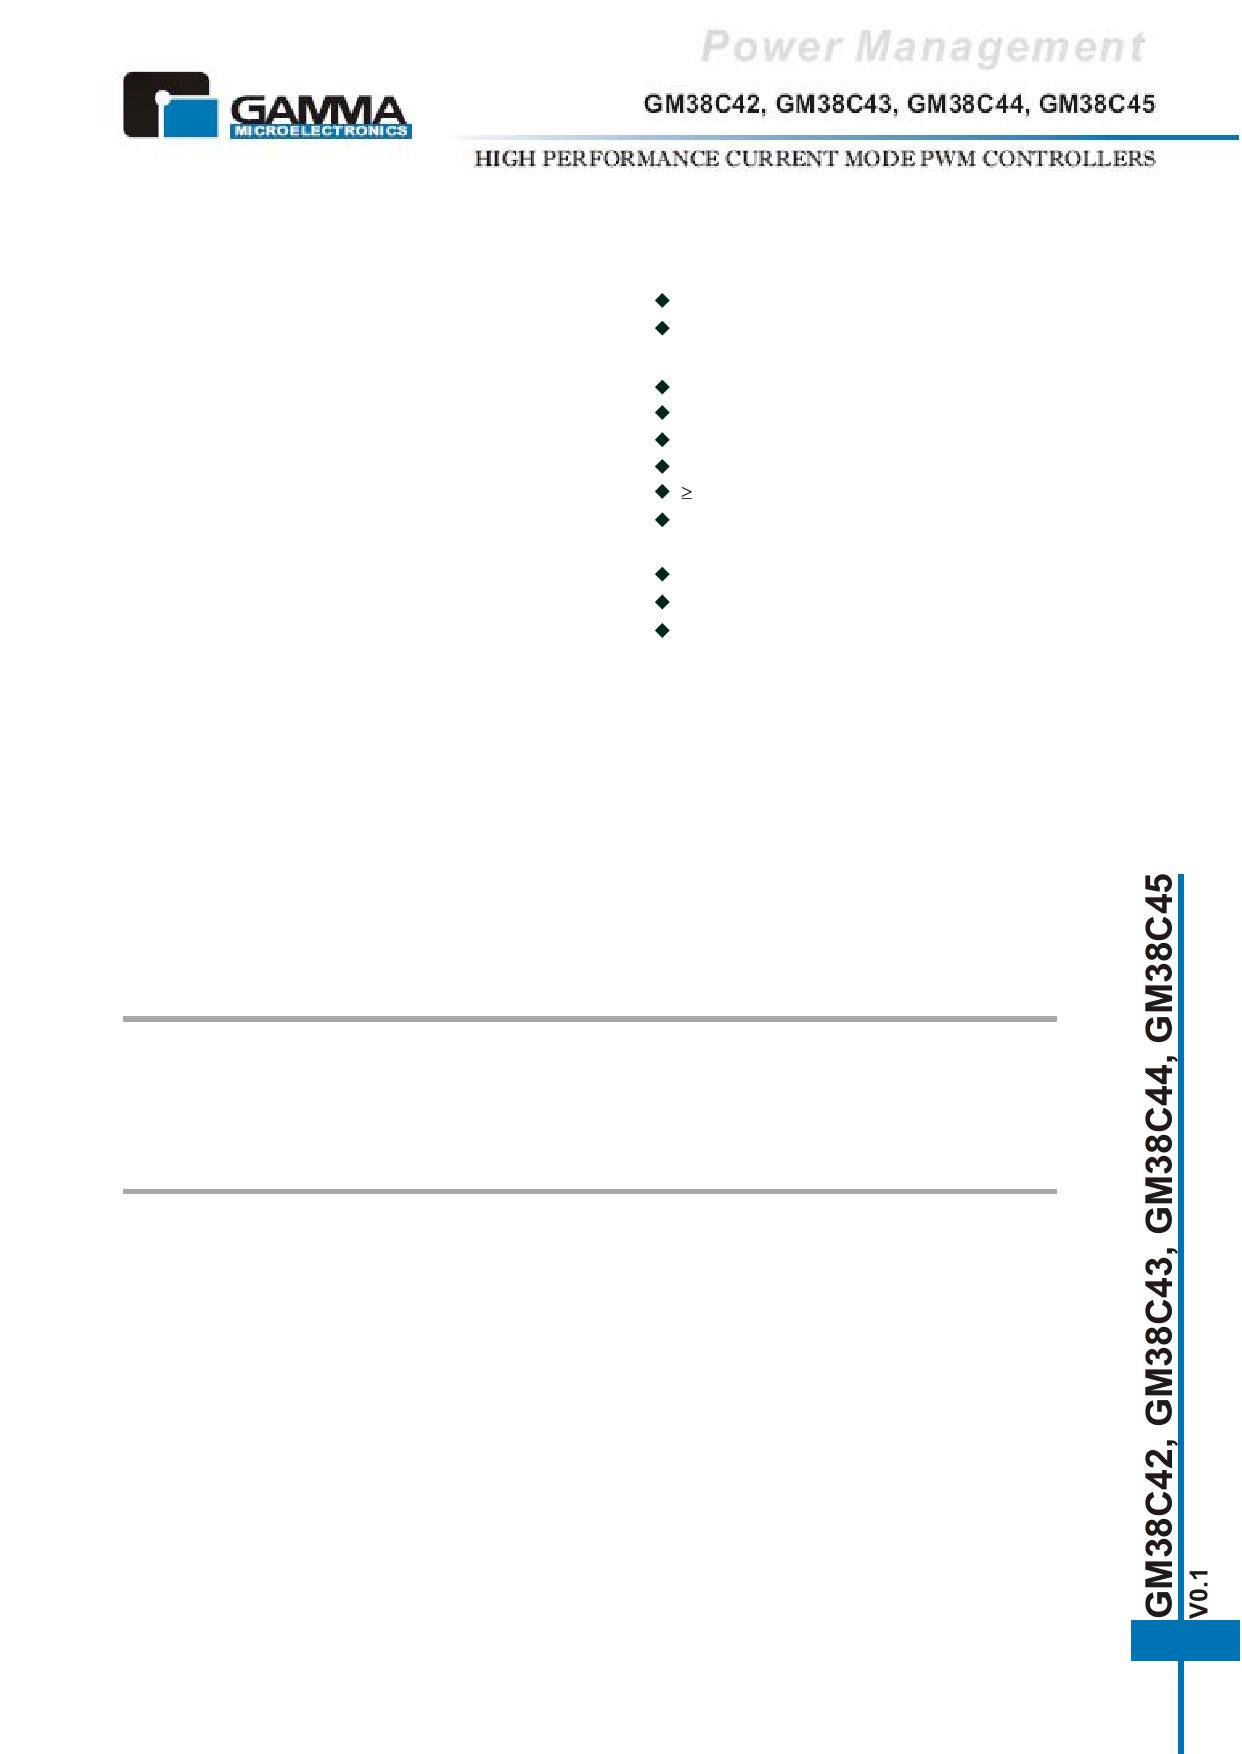 GM38C43 دیتاشیت PDF